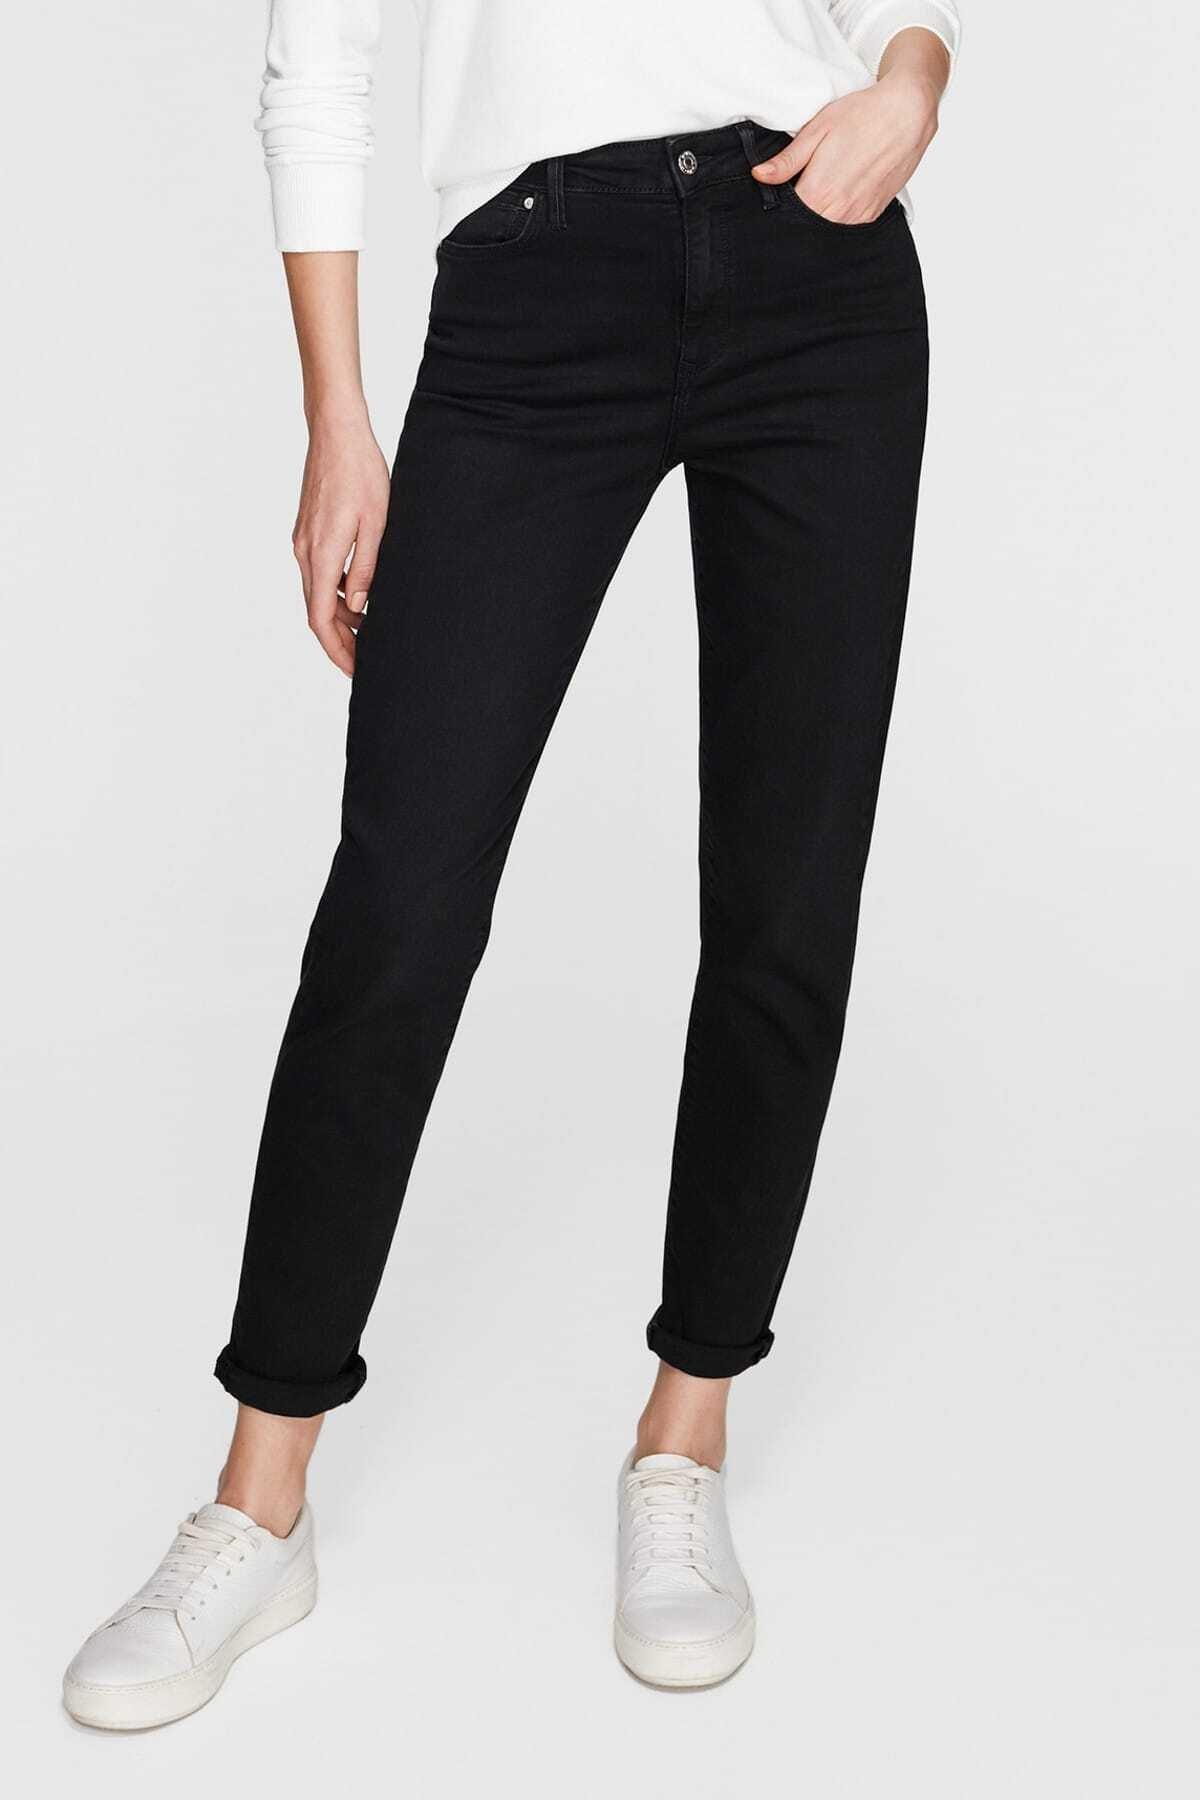 Kadın Siyah Renk Mom Jean Pantolon